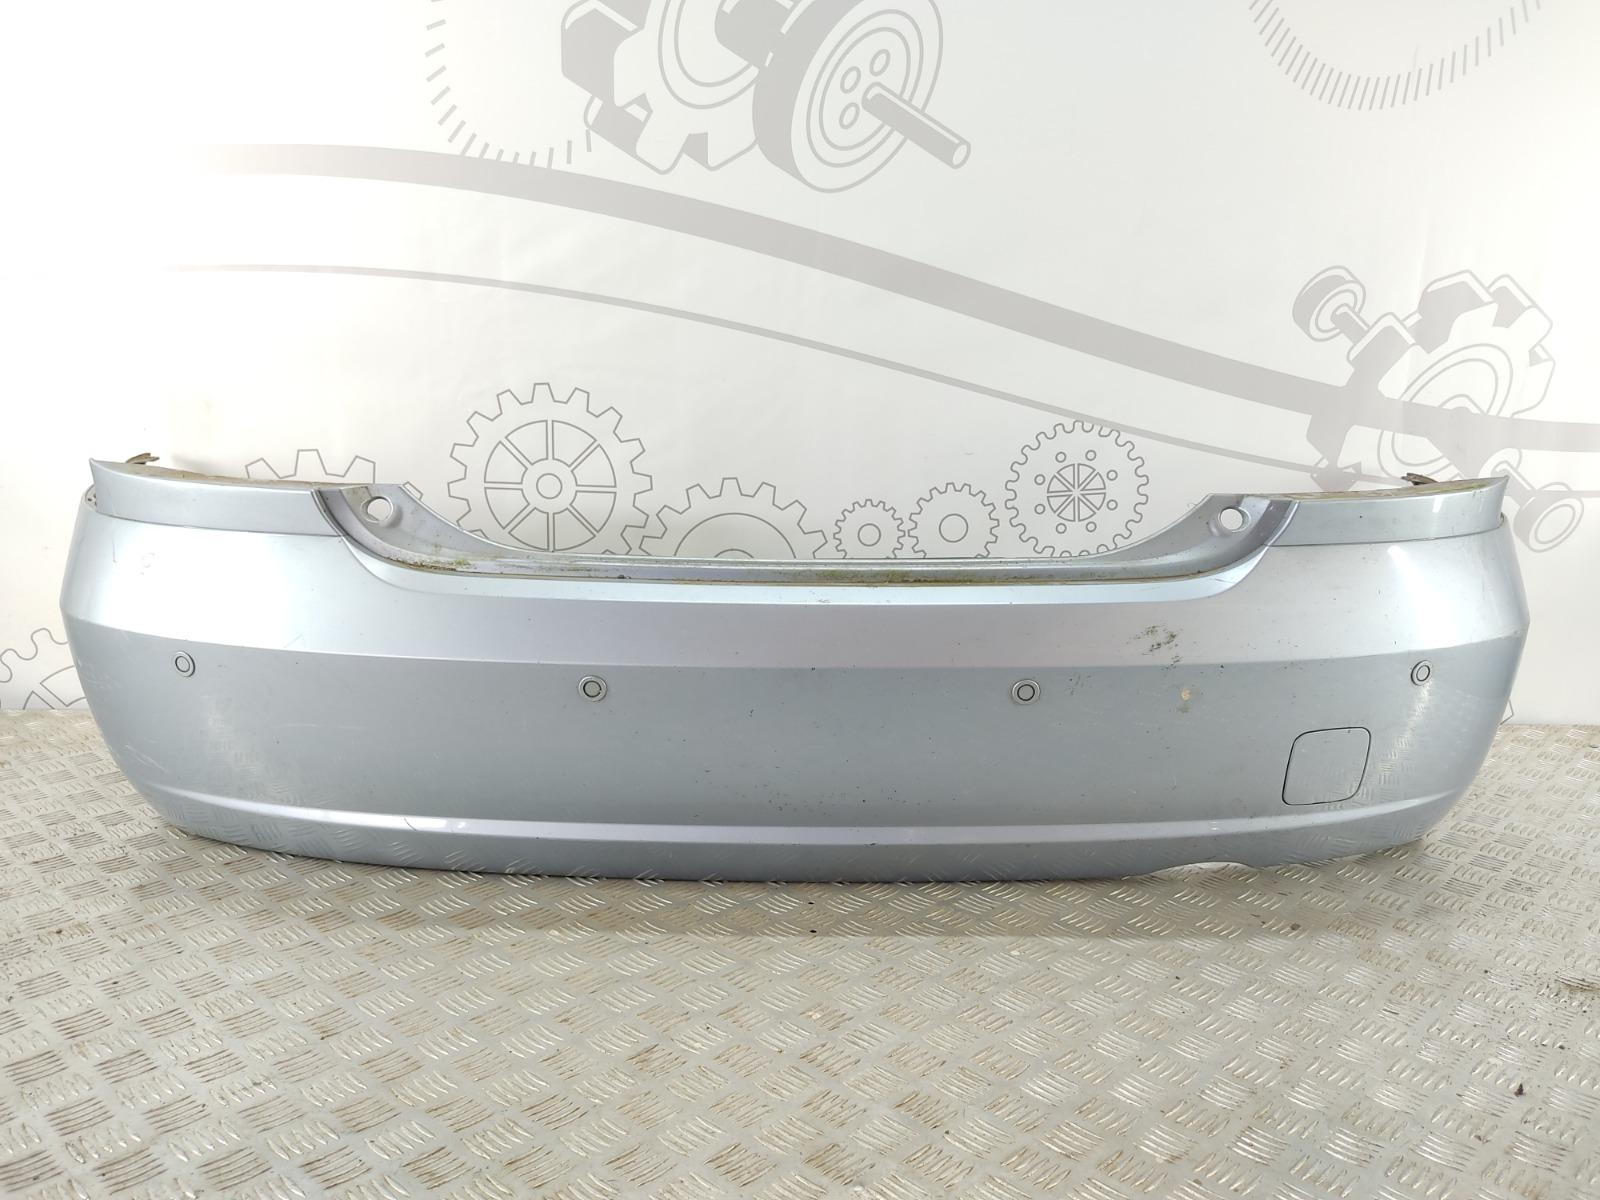 Бампер задний Nissan Almera N16 1.5 I 2005 (б/у)